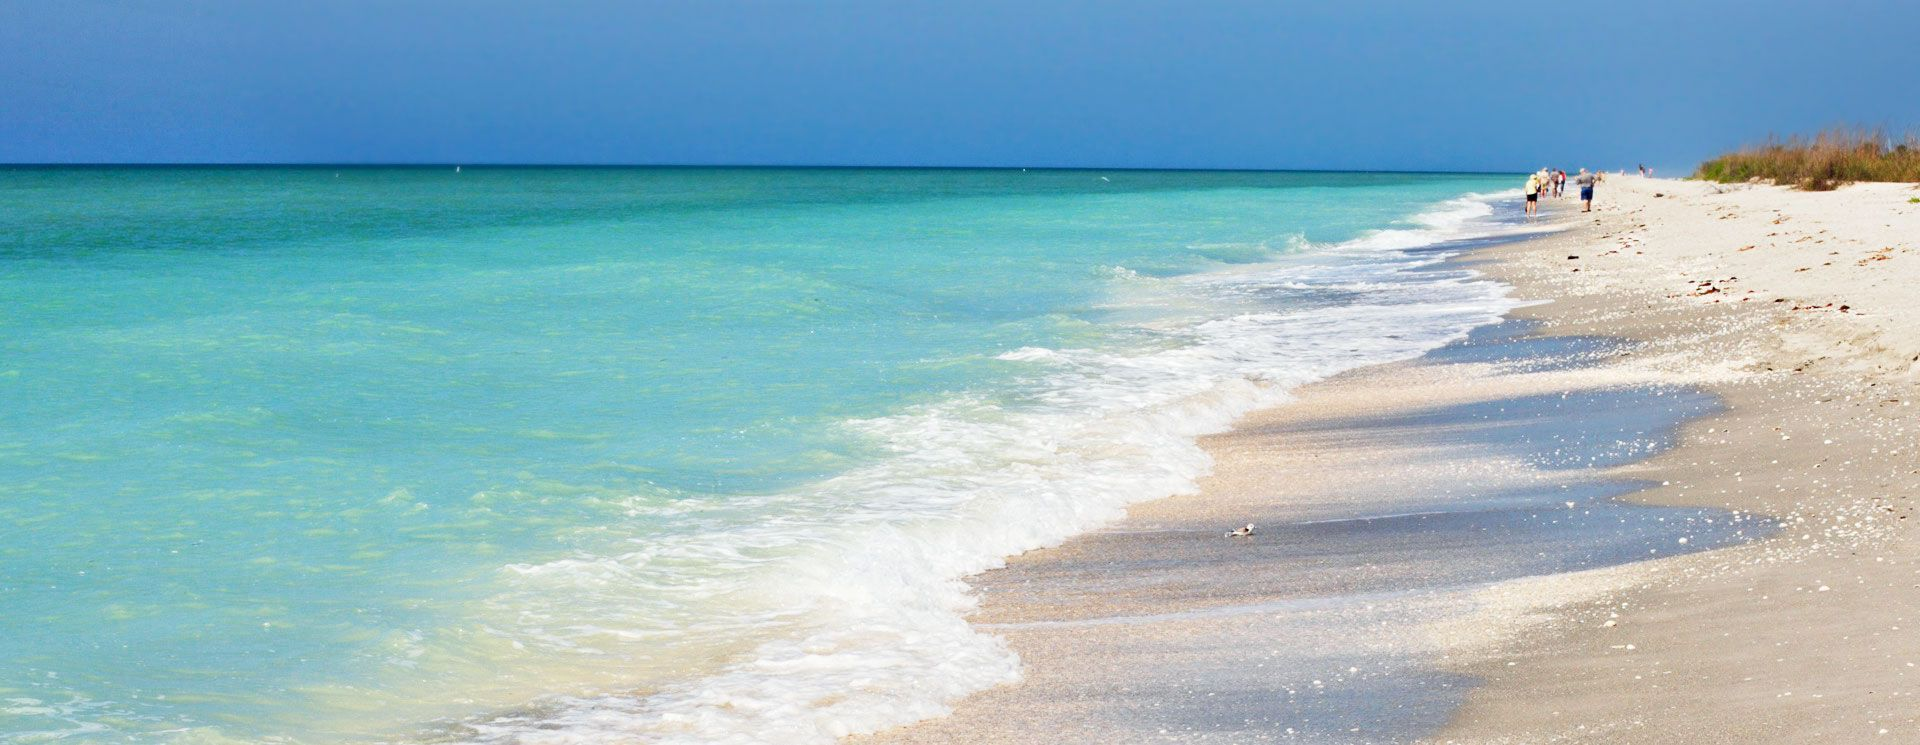 Sanibel Island All Inclusive Packages: Vacations Sanibel Island Florida